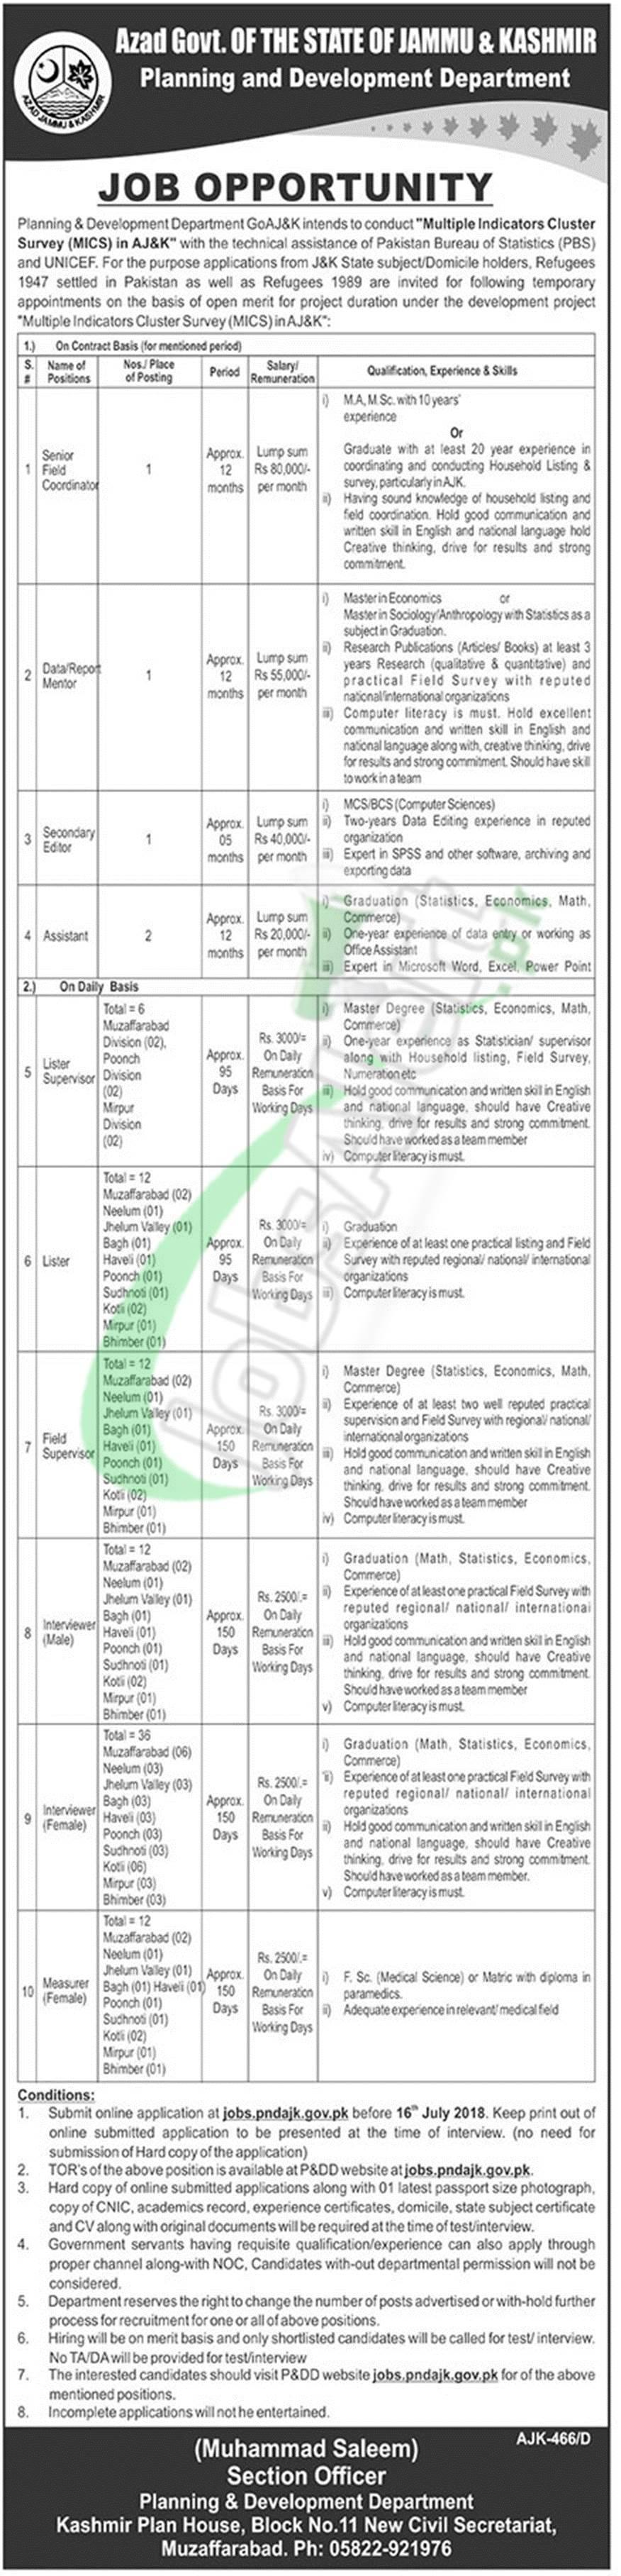 Planning and Development Department AJK Jobs